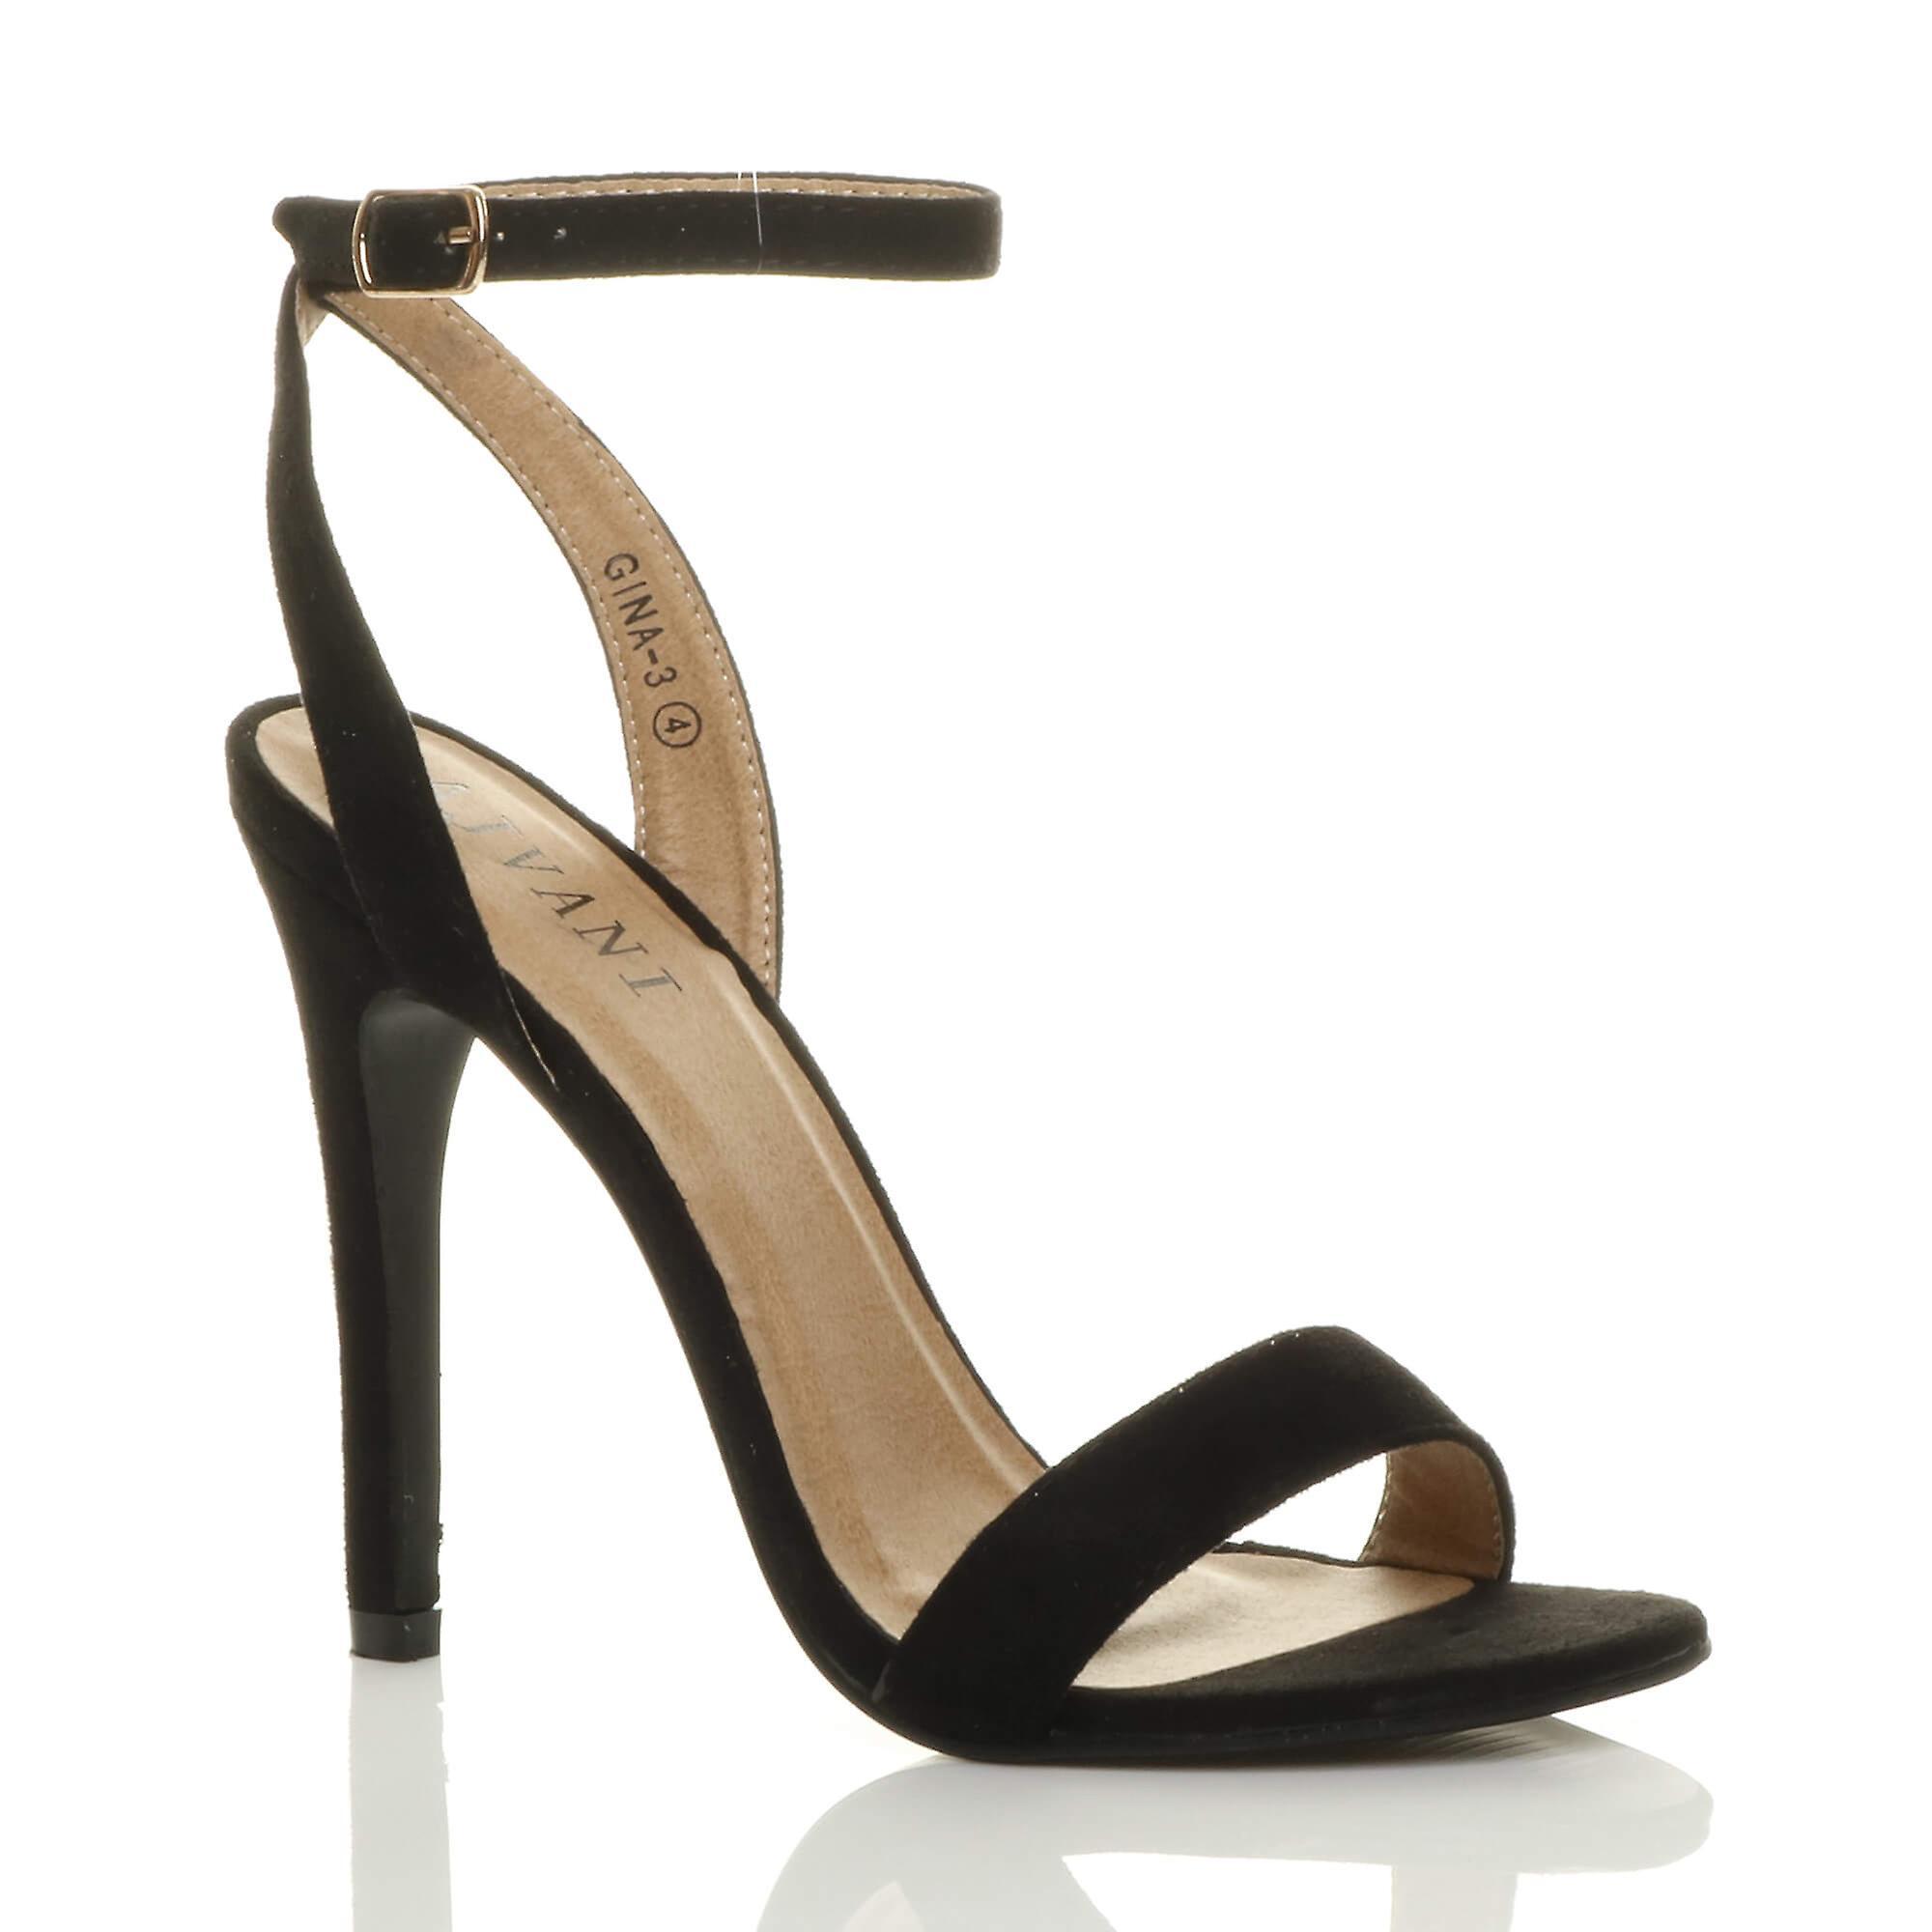 Ajvani damskie szpilki platformy kostki pasek ledwo tam paski sandały buty m1BI3